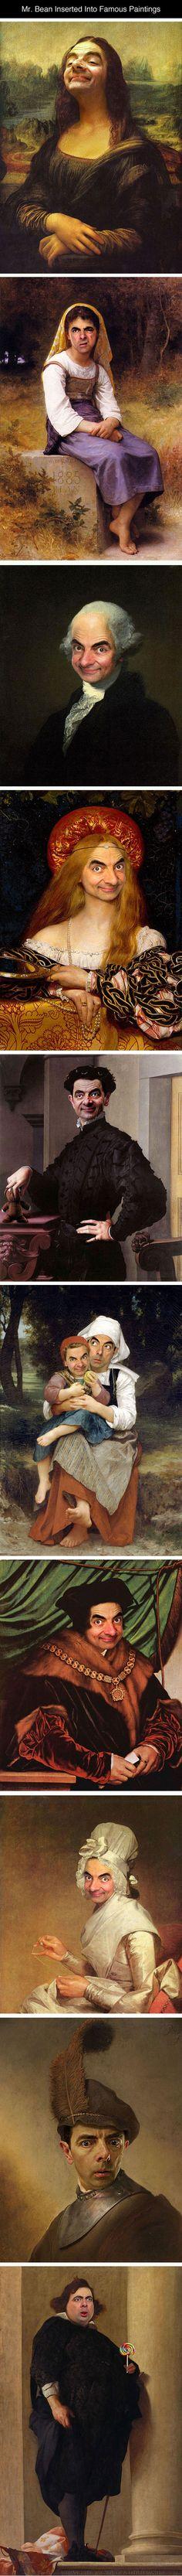 Mr. Bean Art